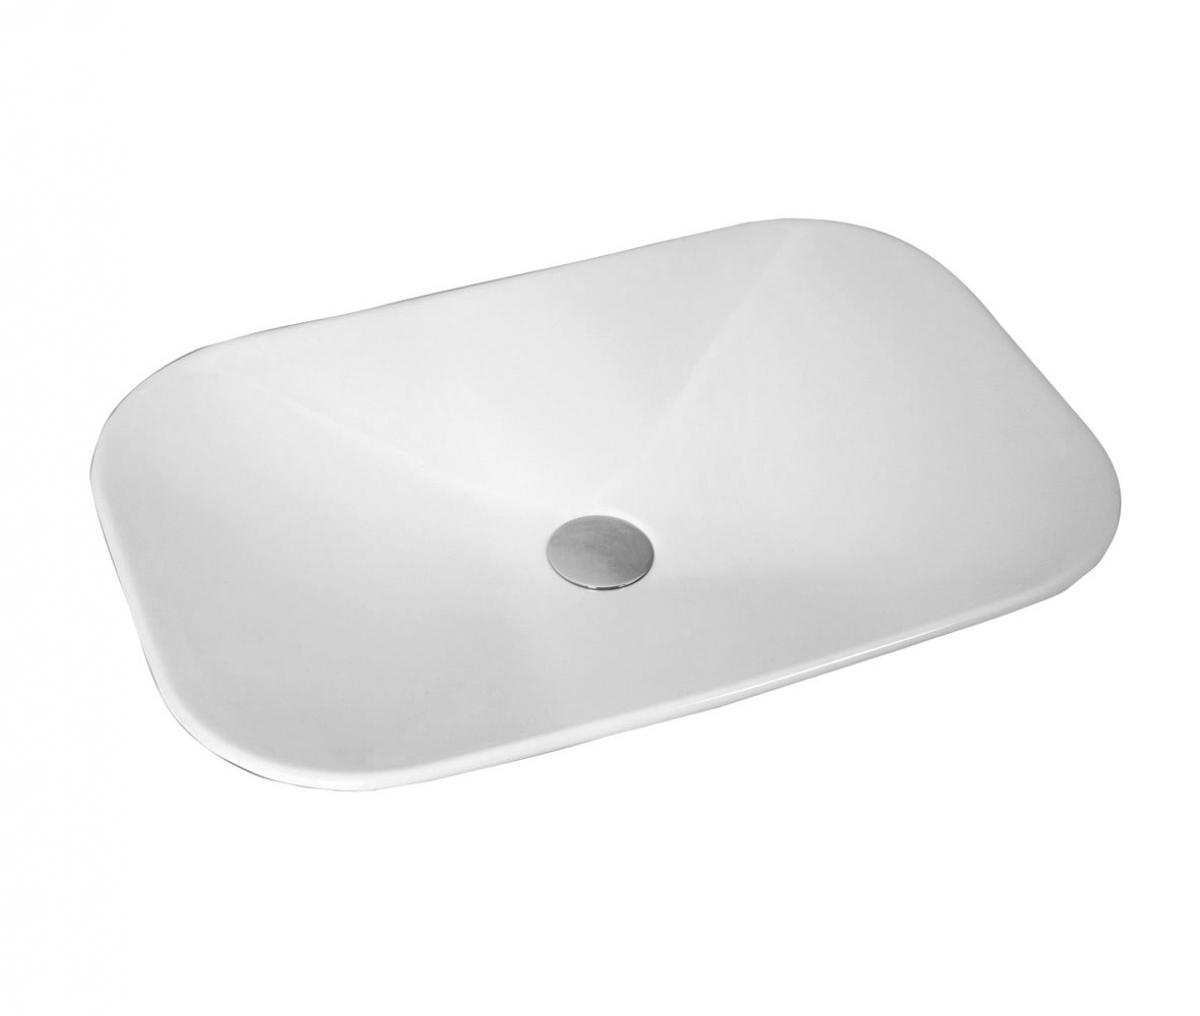 vitra options piu due rectangular countertop basin vitrad154 5221 home ...